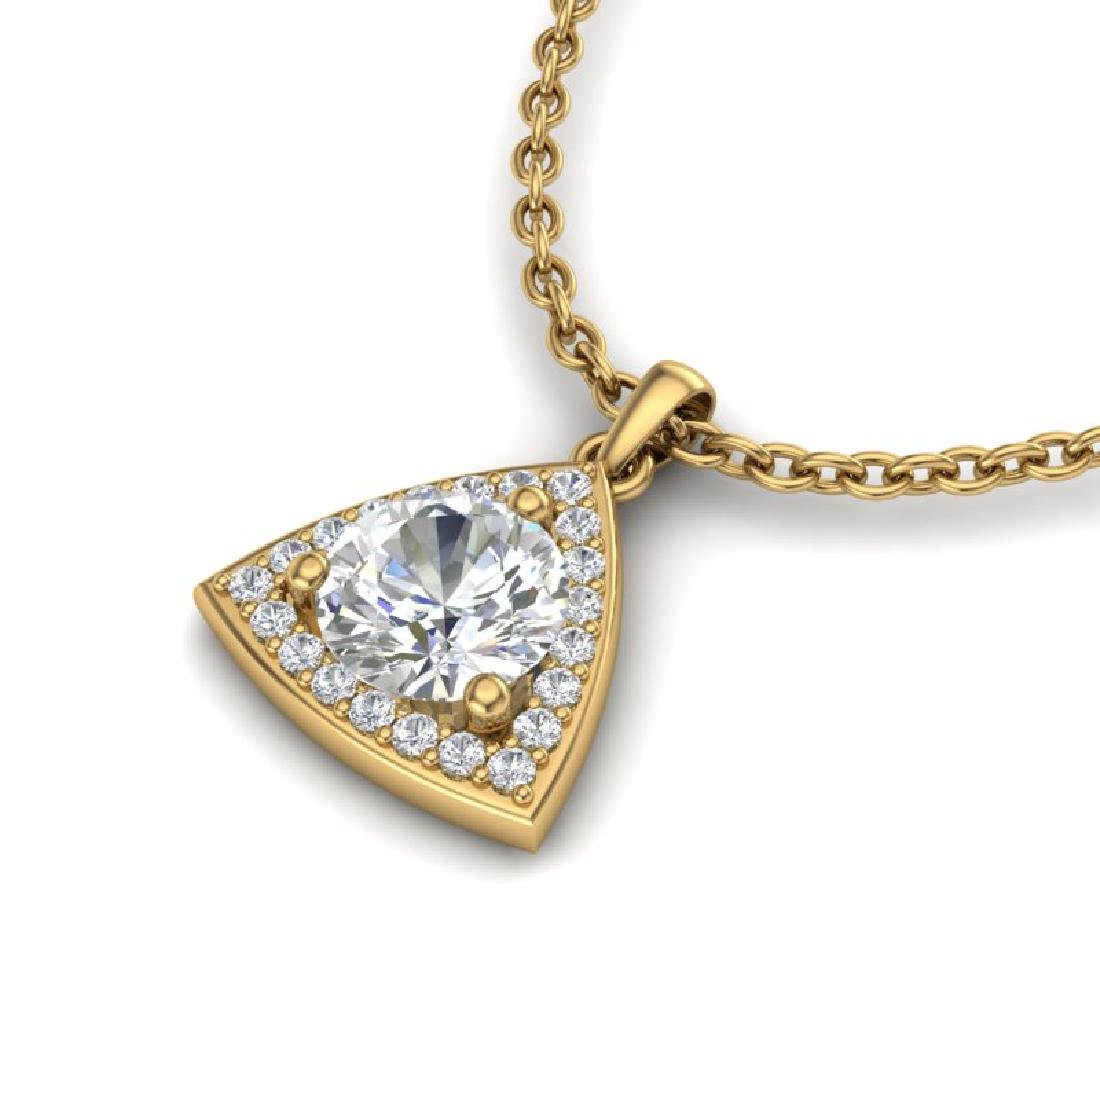 1.50 CTW VS/SI Diamond Necklace 18K Yellow Gold - 2